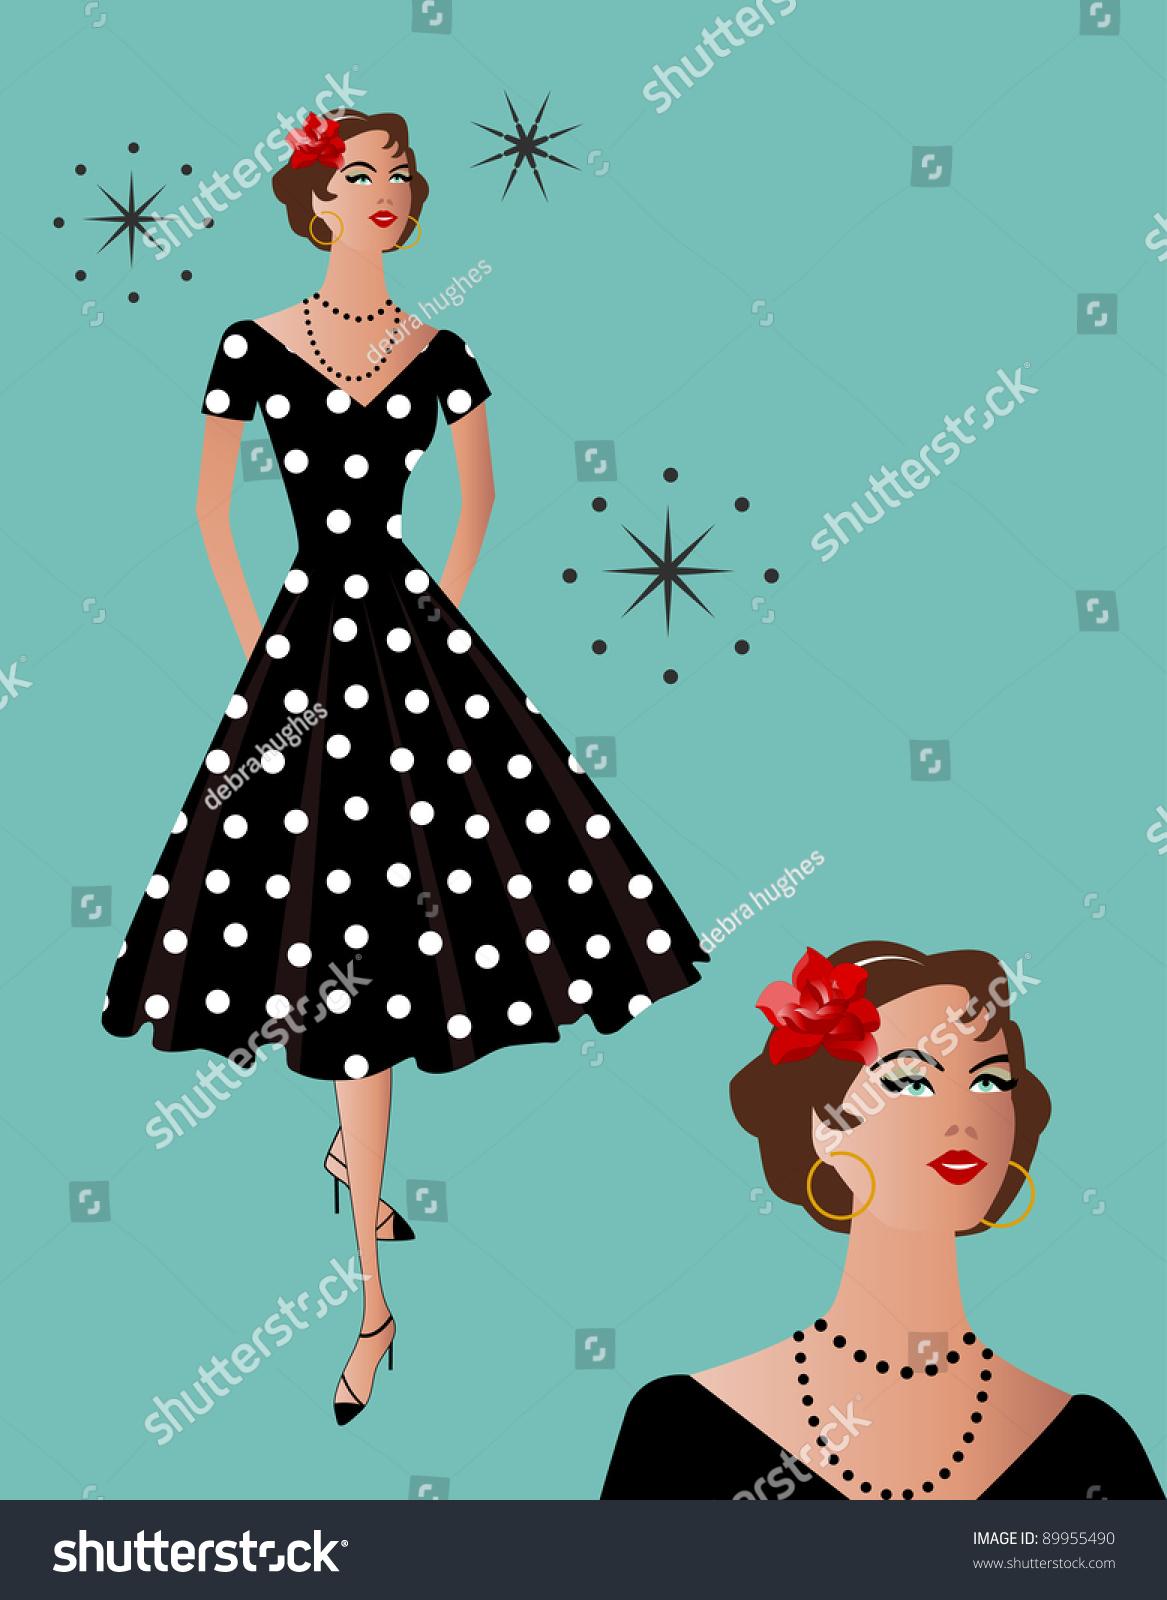 Black dress retro - Black Polka Dot Retro Dress